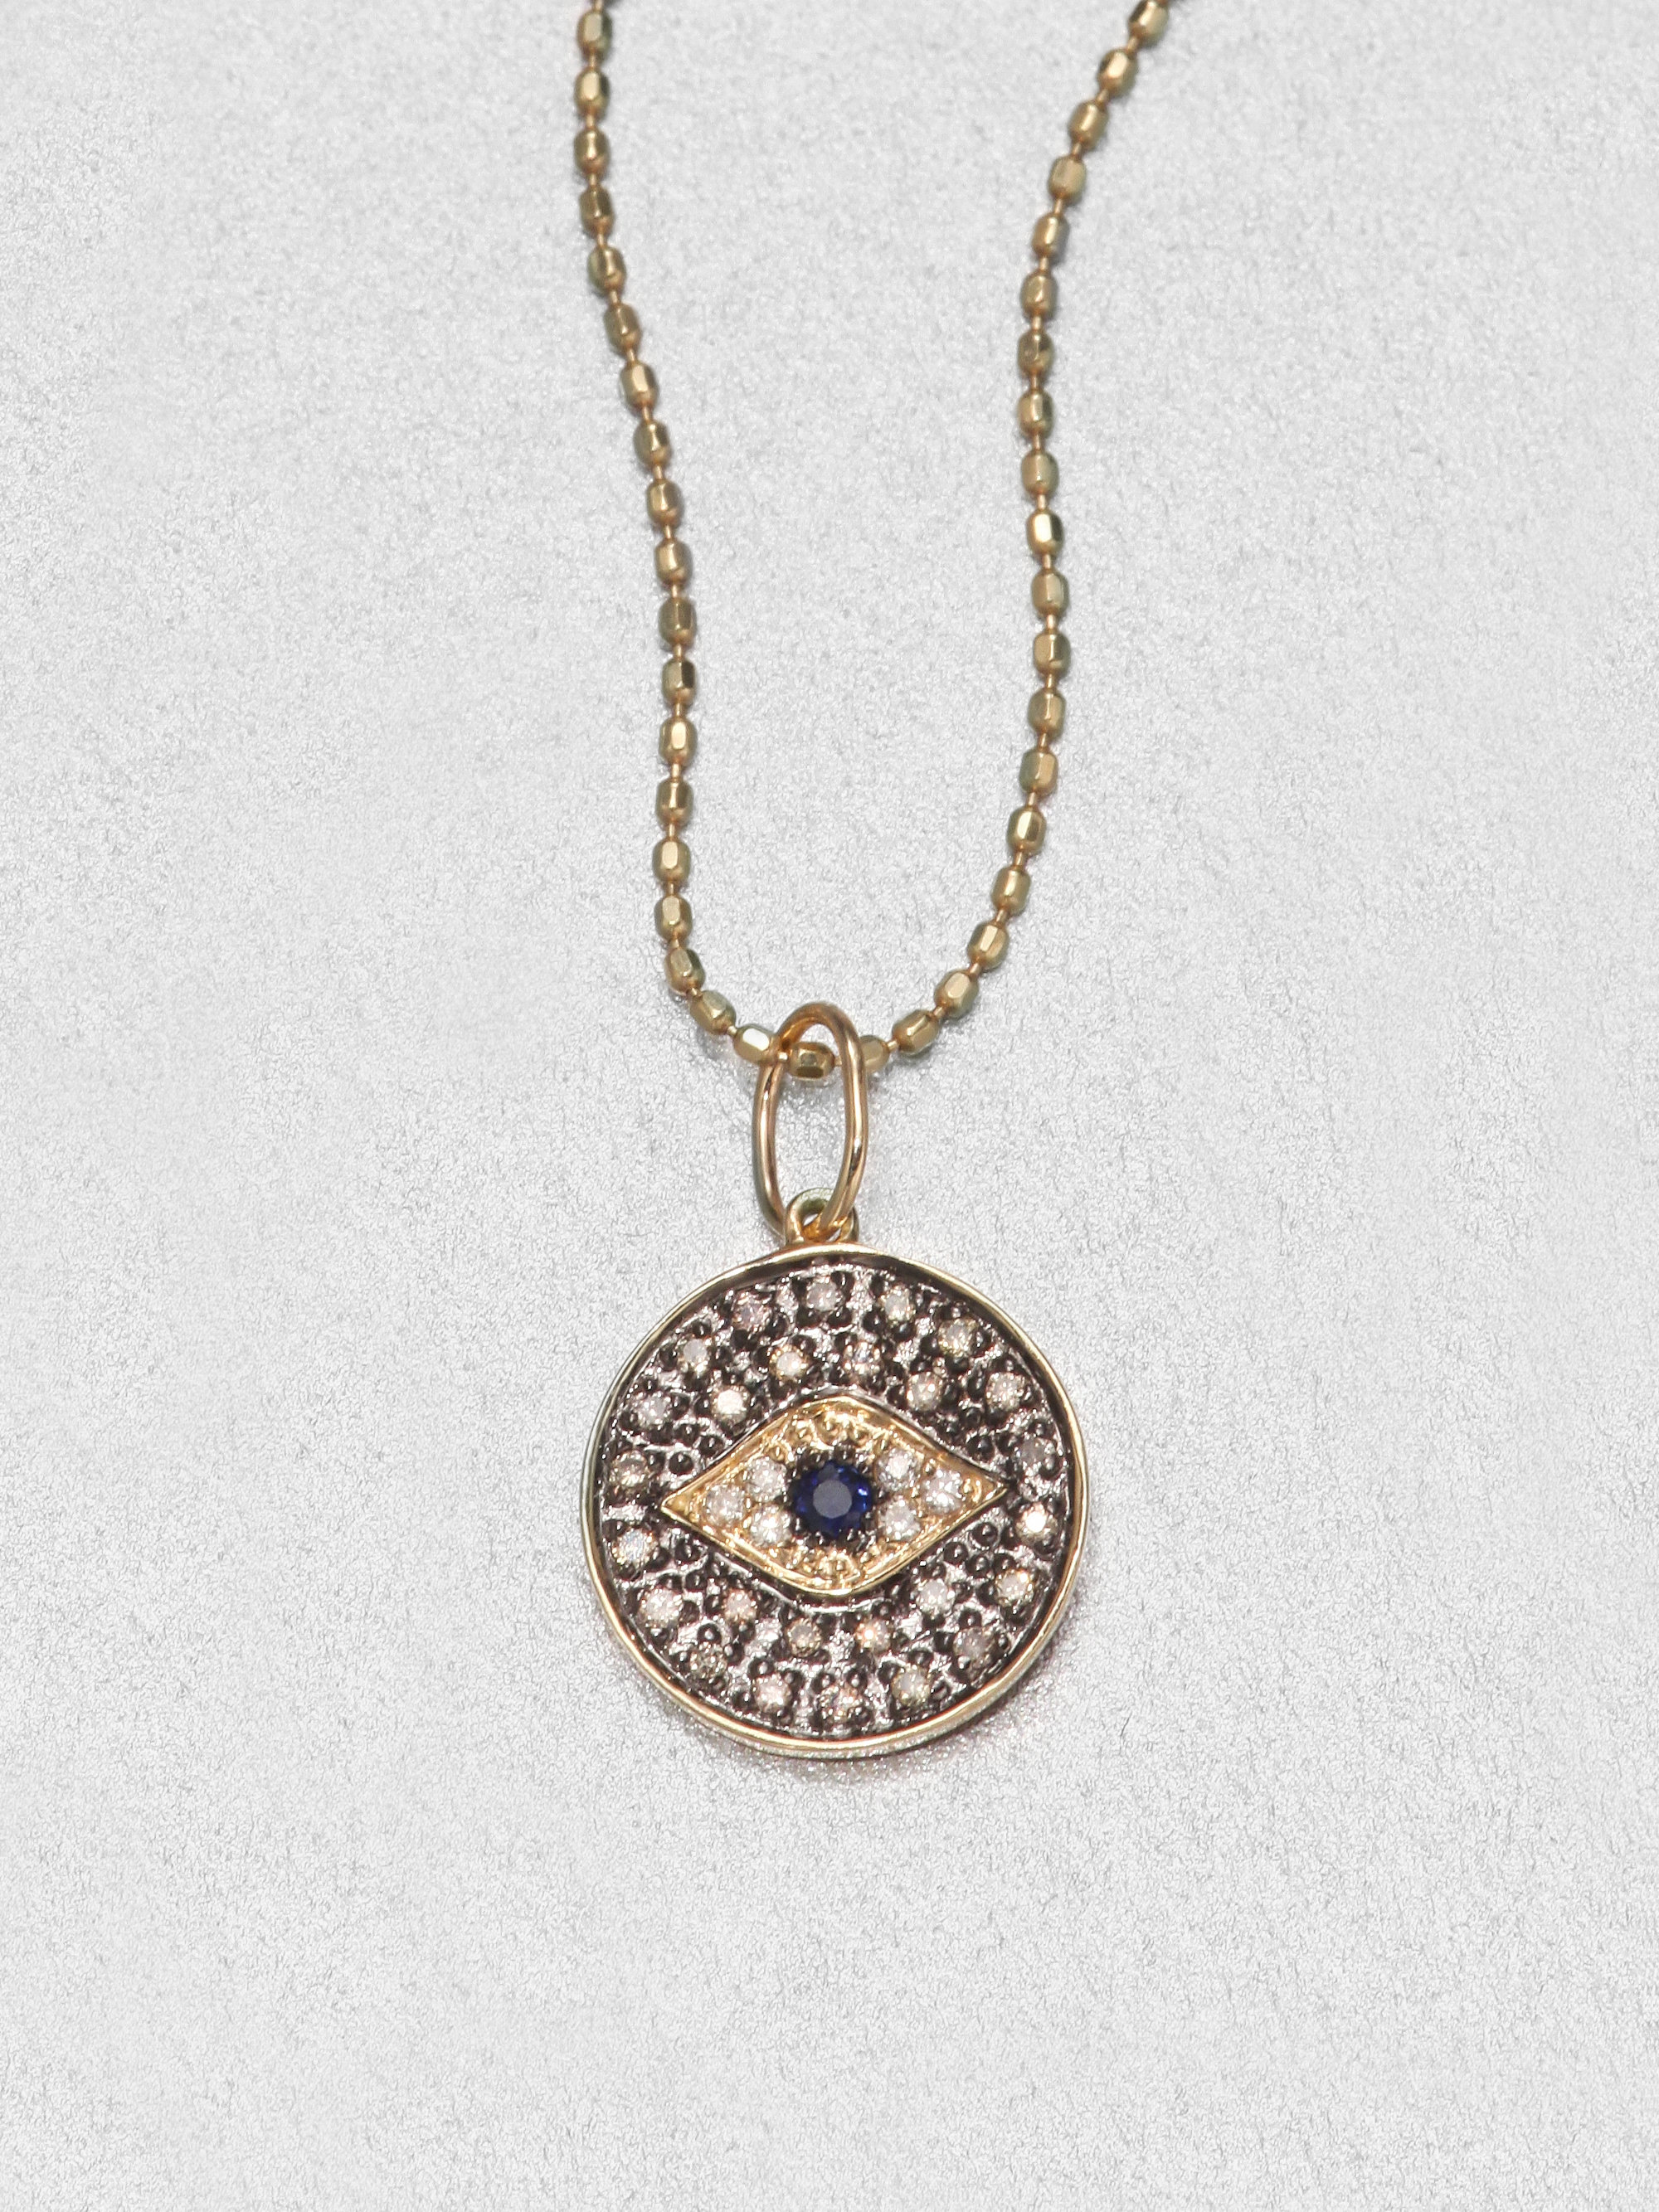 Unique gold pendant for necklace jewellrys website sydney evan diamond 14k gold small evil eye medallion pendant aloadofball Images